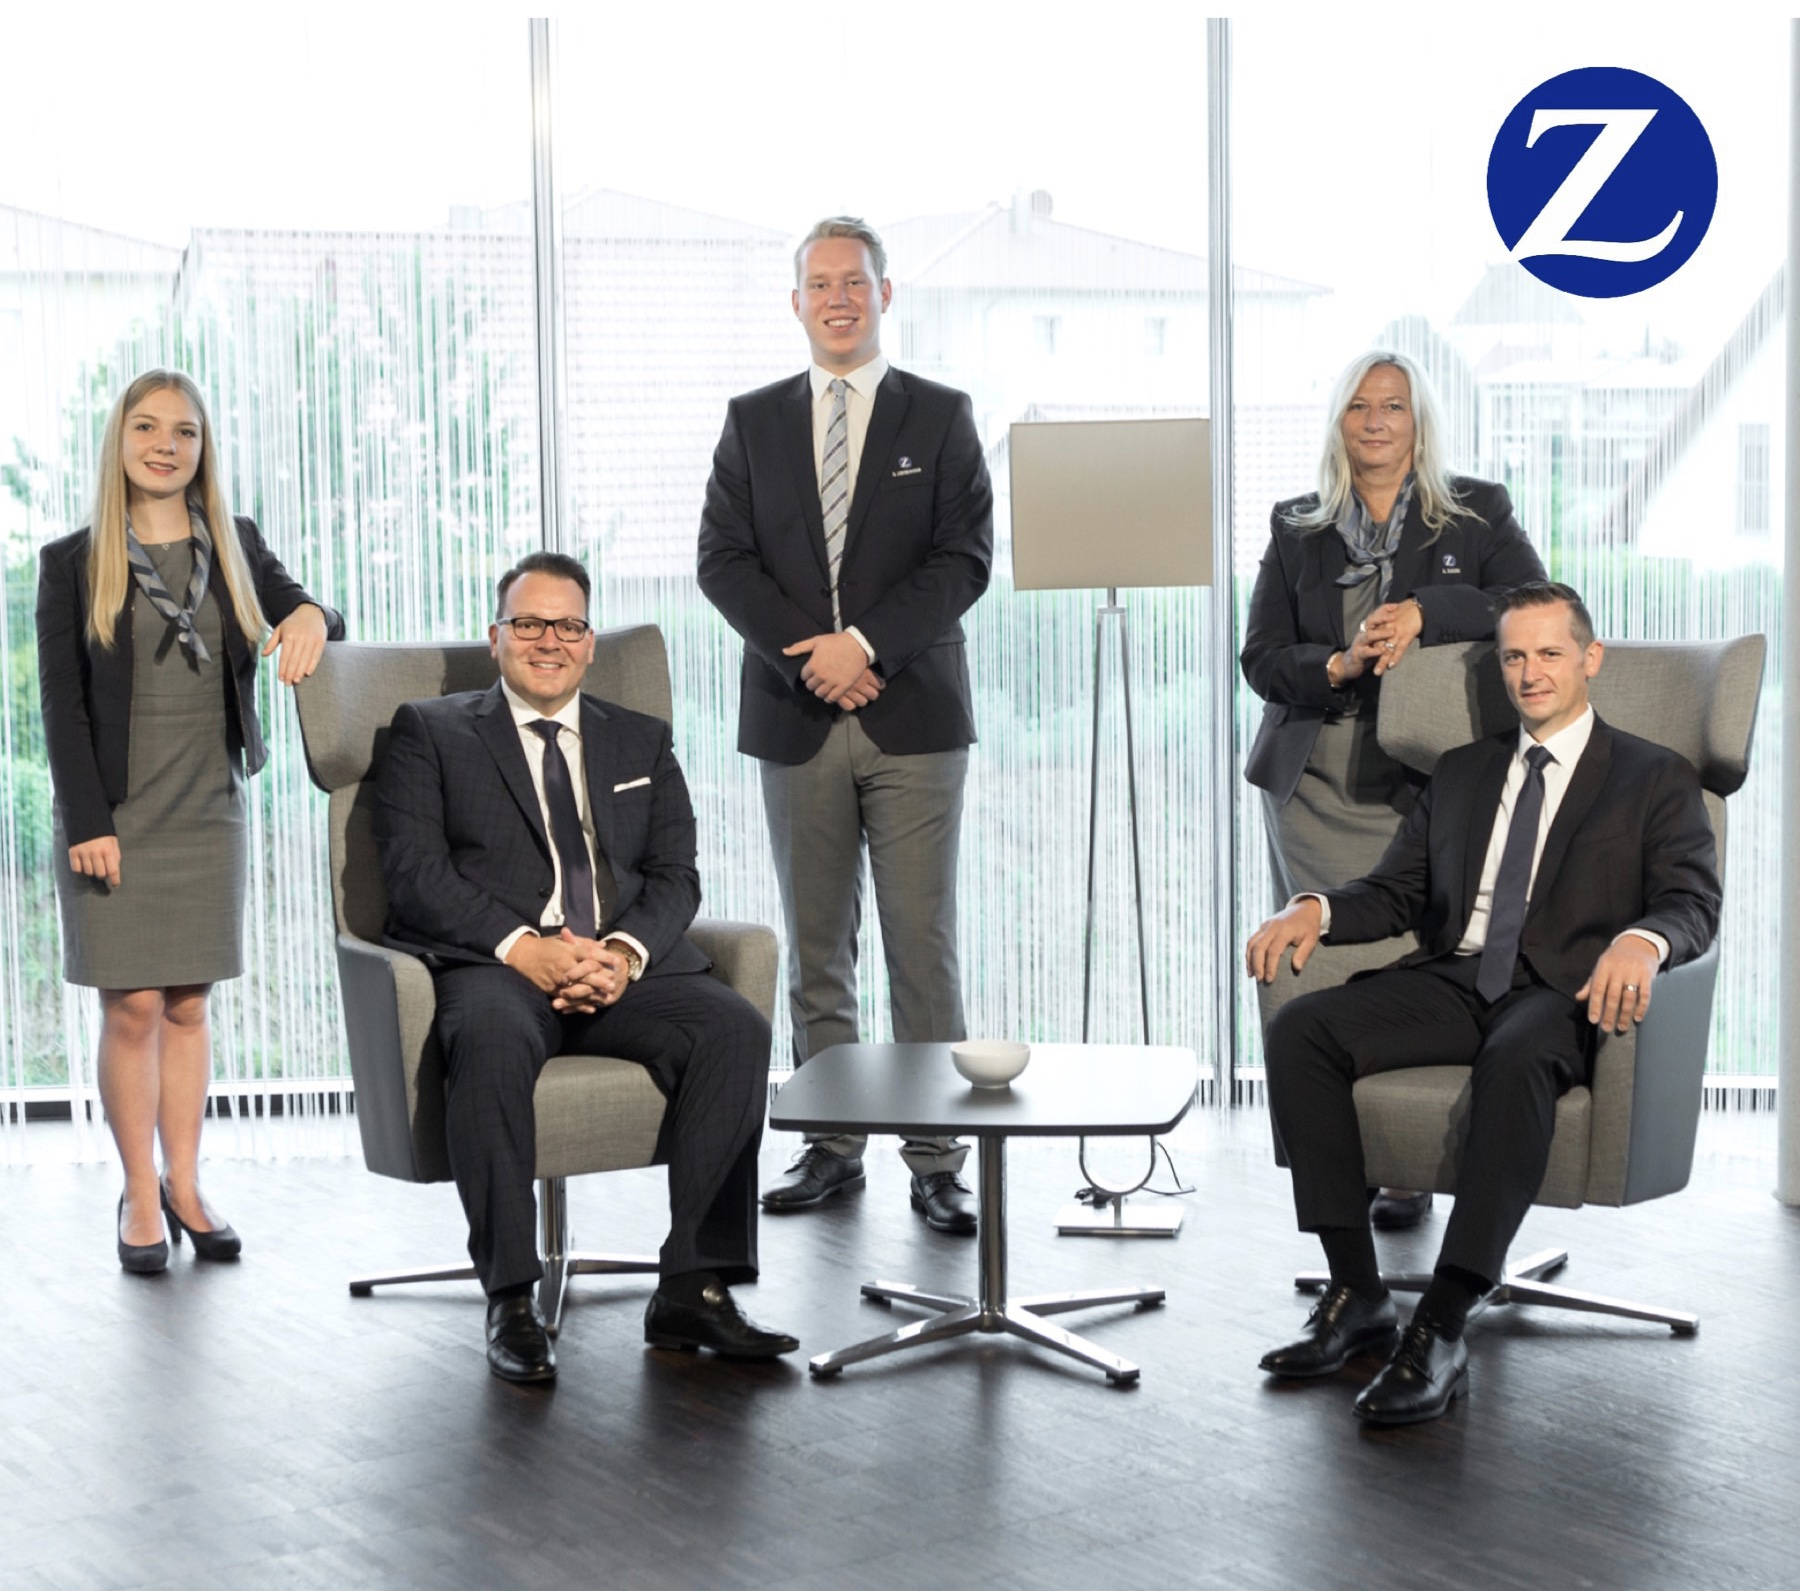 Zurich Versicherung: Jörg Riediger